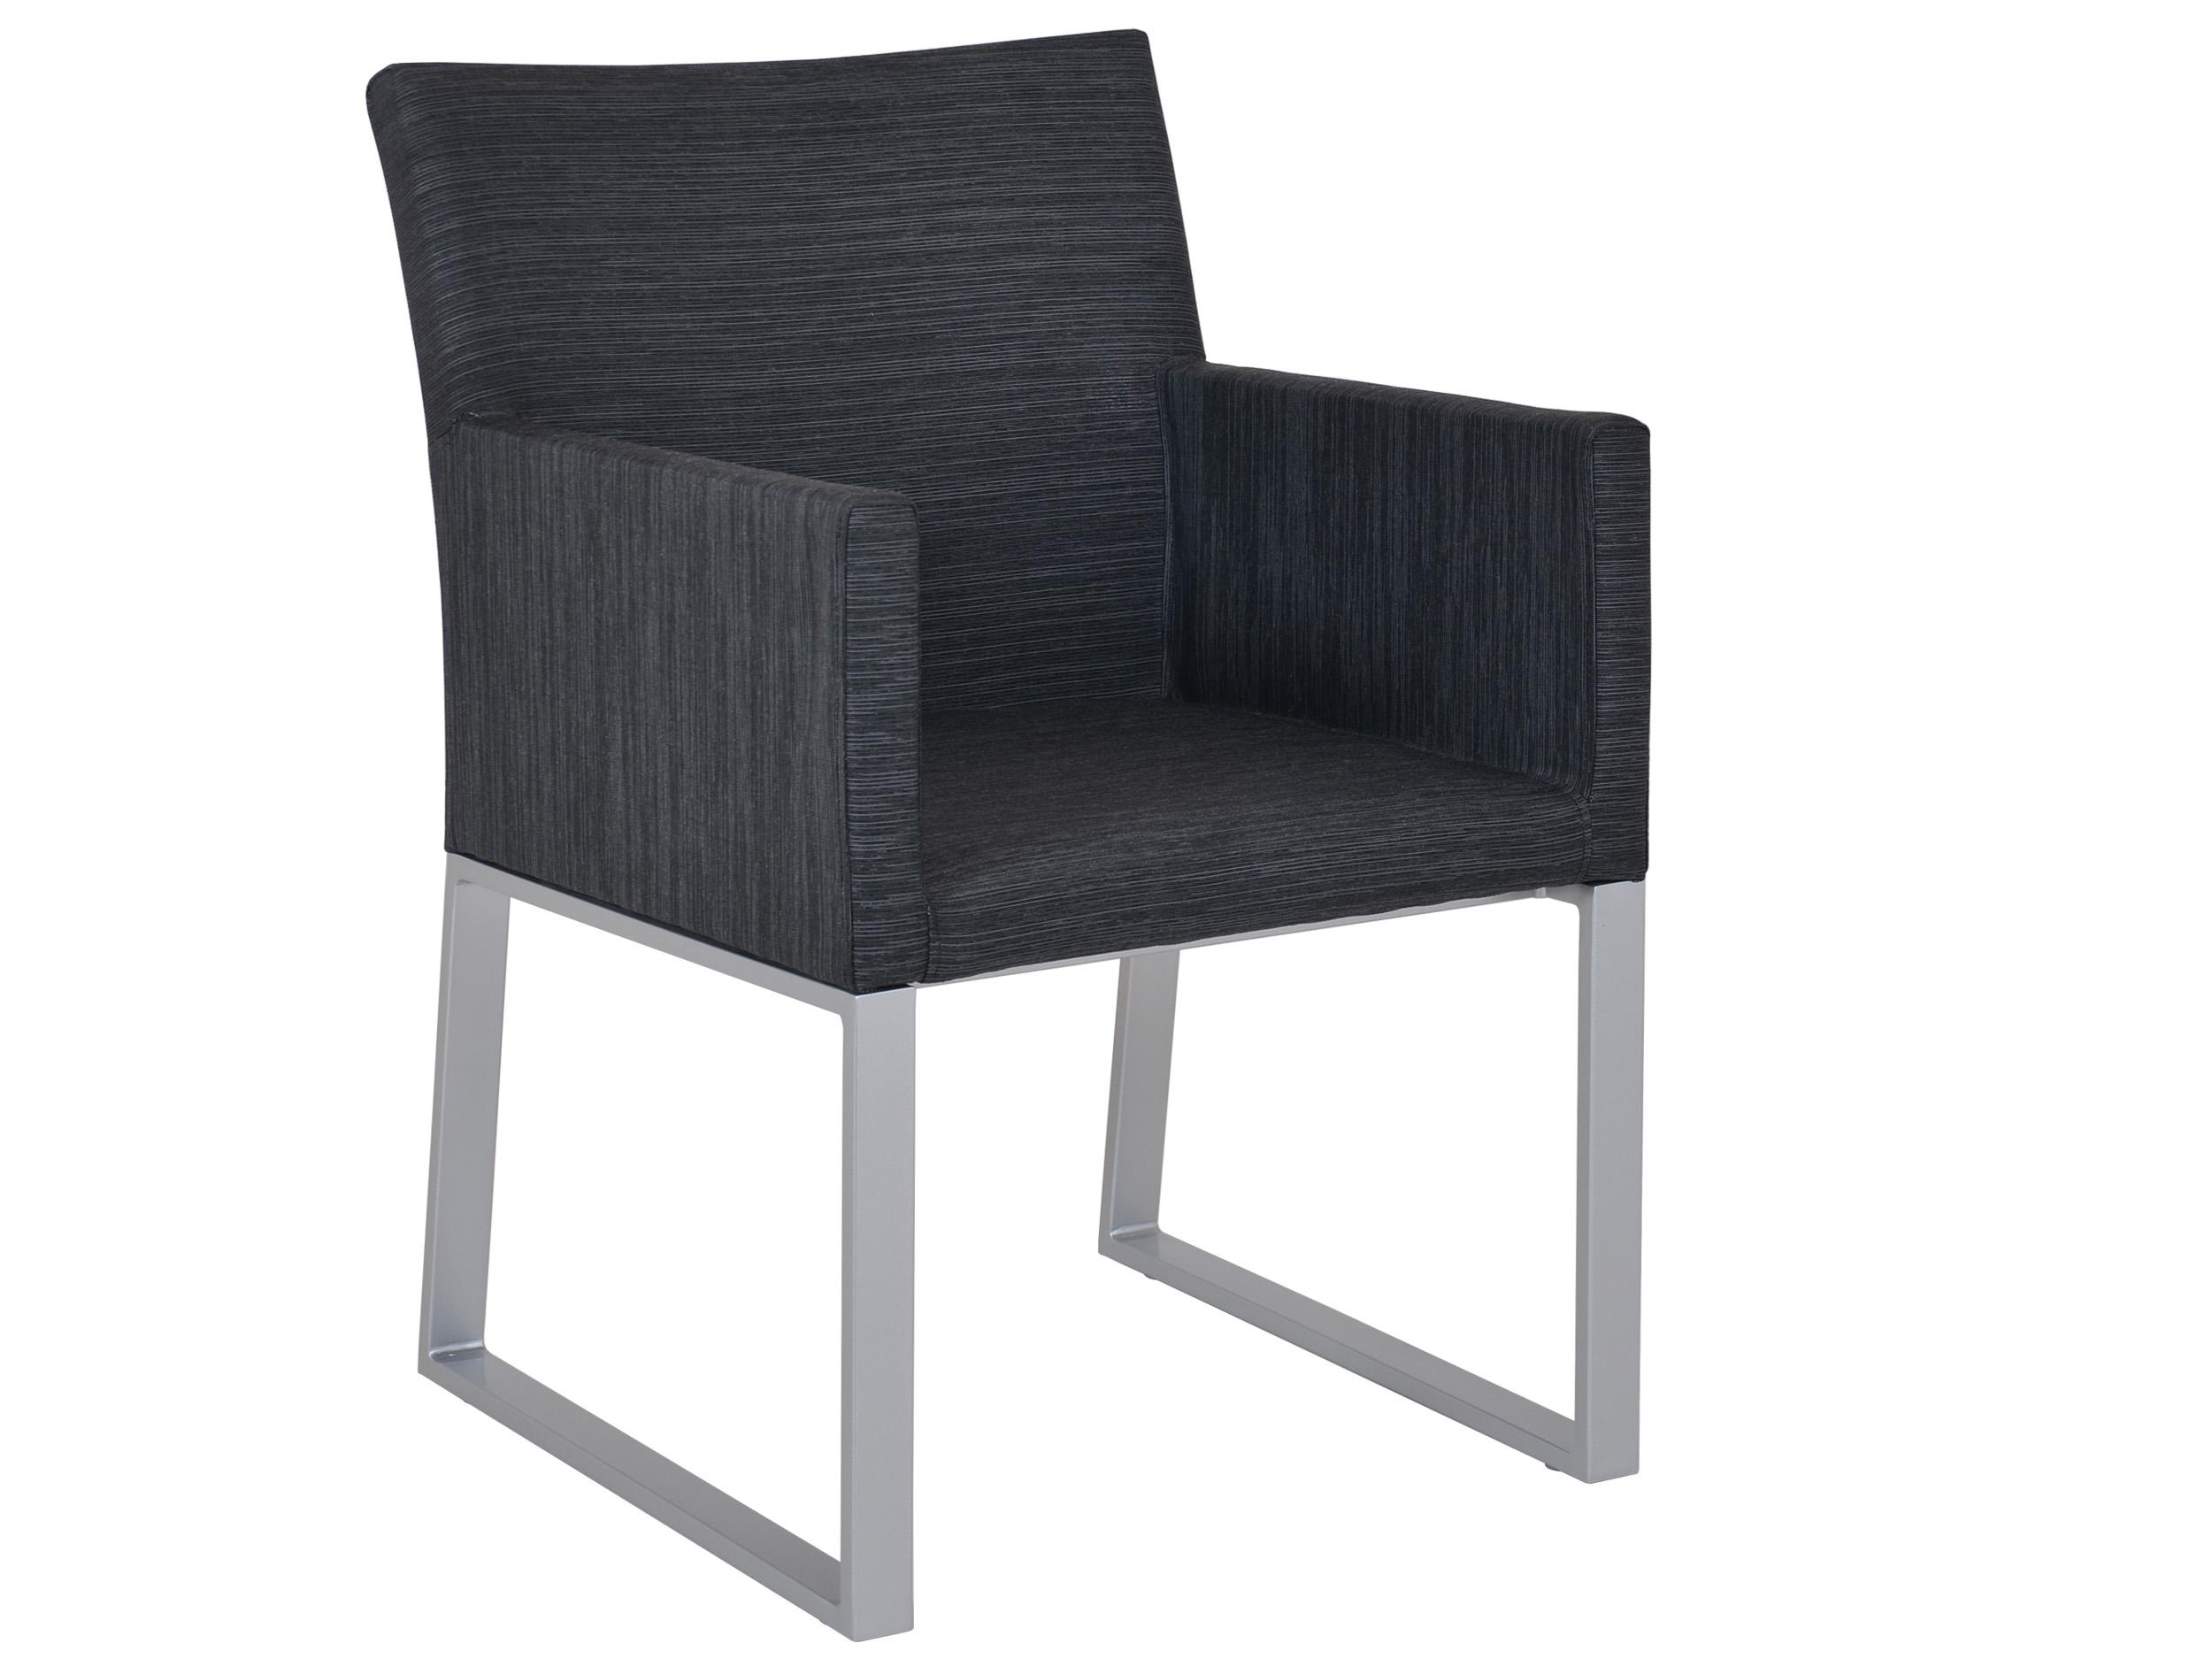 inspiration gartenstuhl metall pulverbeschichtet konzept garten design ideen. Black Bedroom Furniture Sets. Home Design Ideas